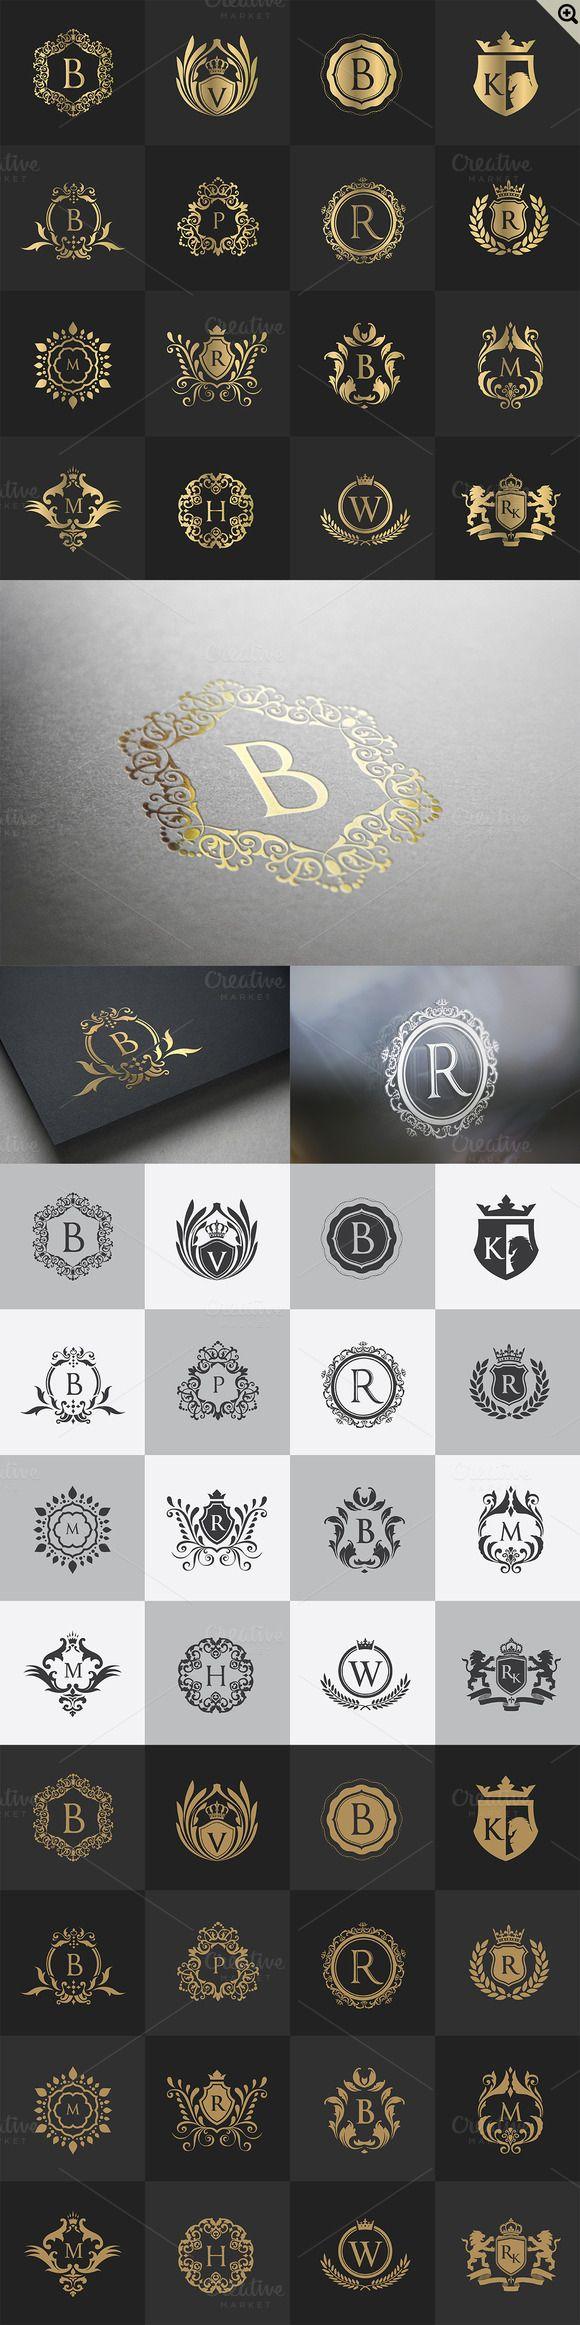 32 Luxury logo set by Super Pig Shop on @creativemarket http://jrstudioweb.com/diseno-grafico/diseno-de-logotipos/